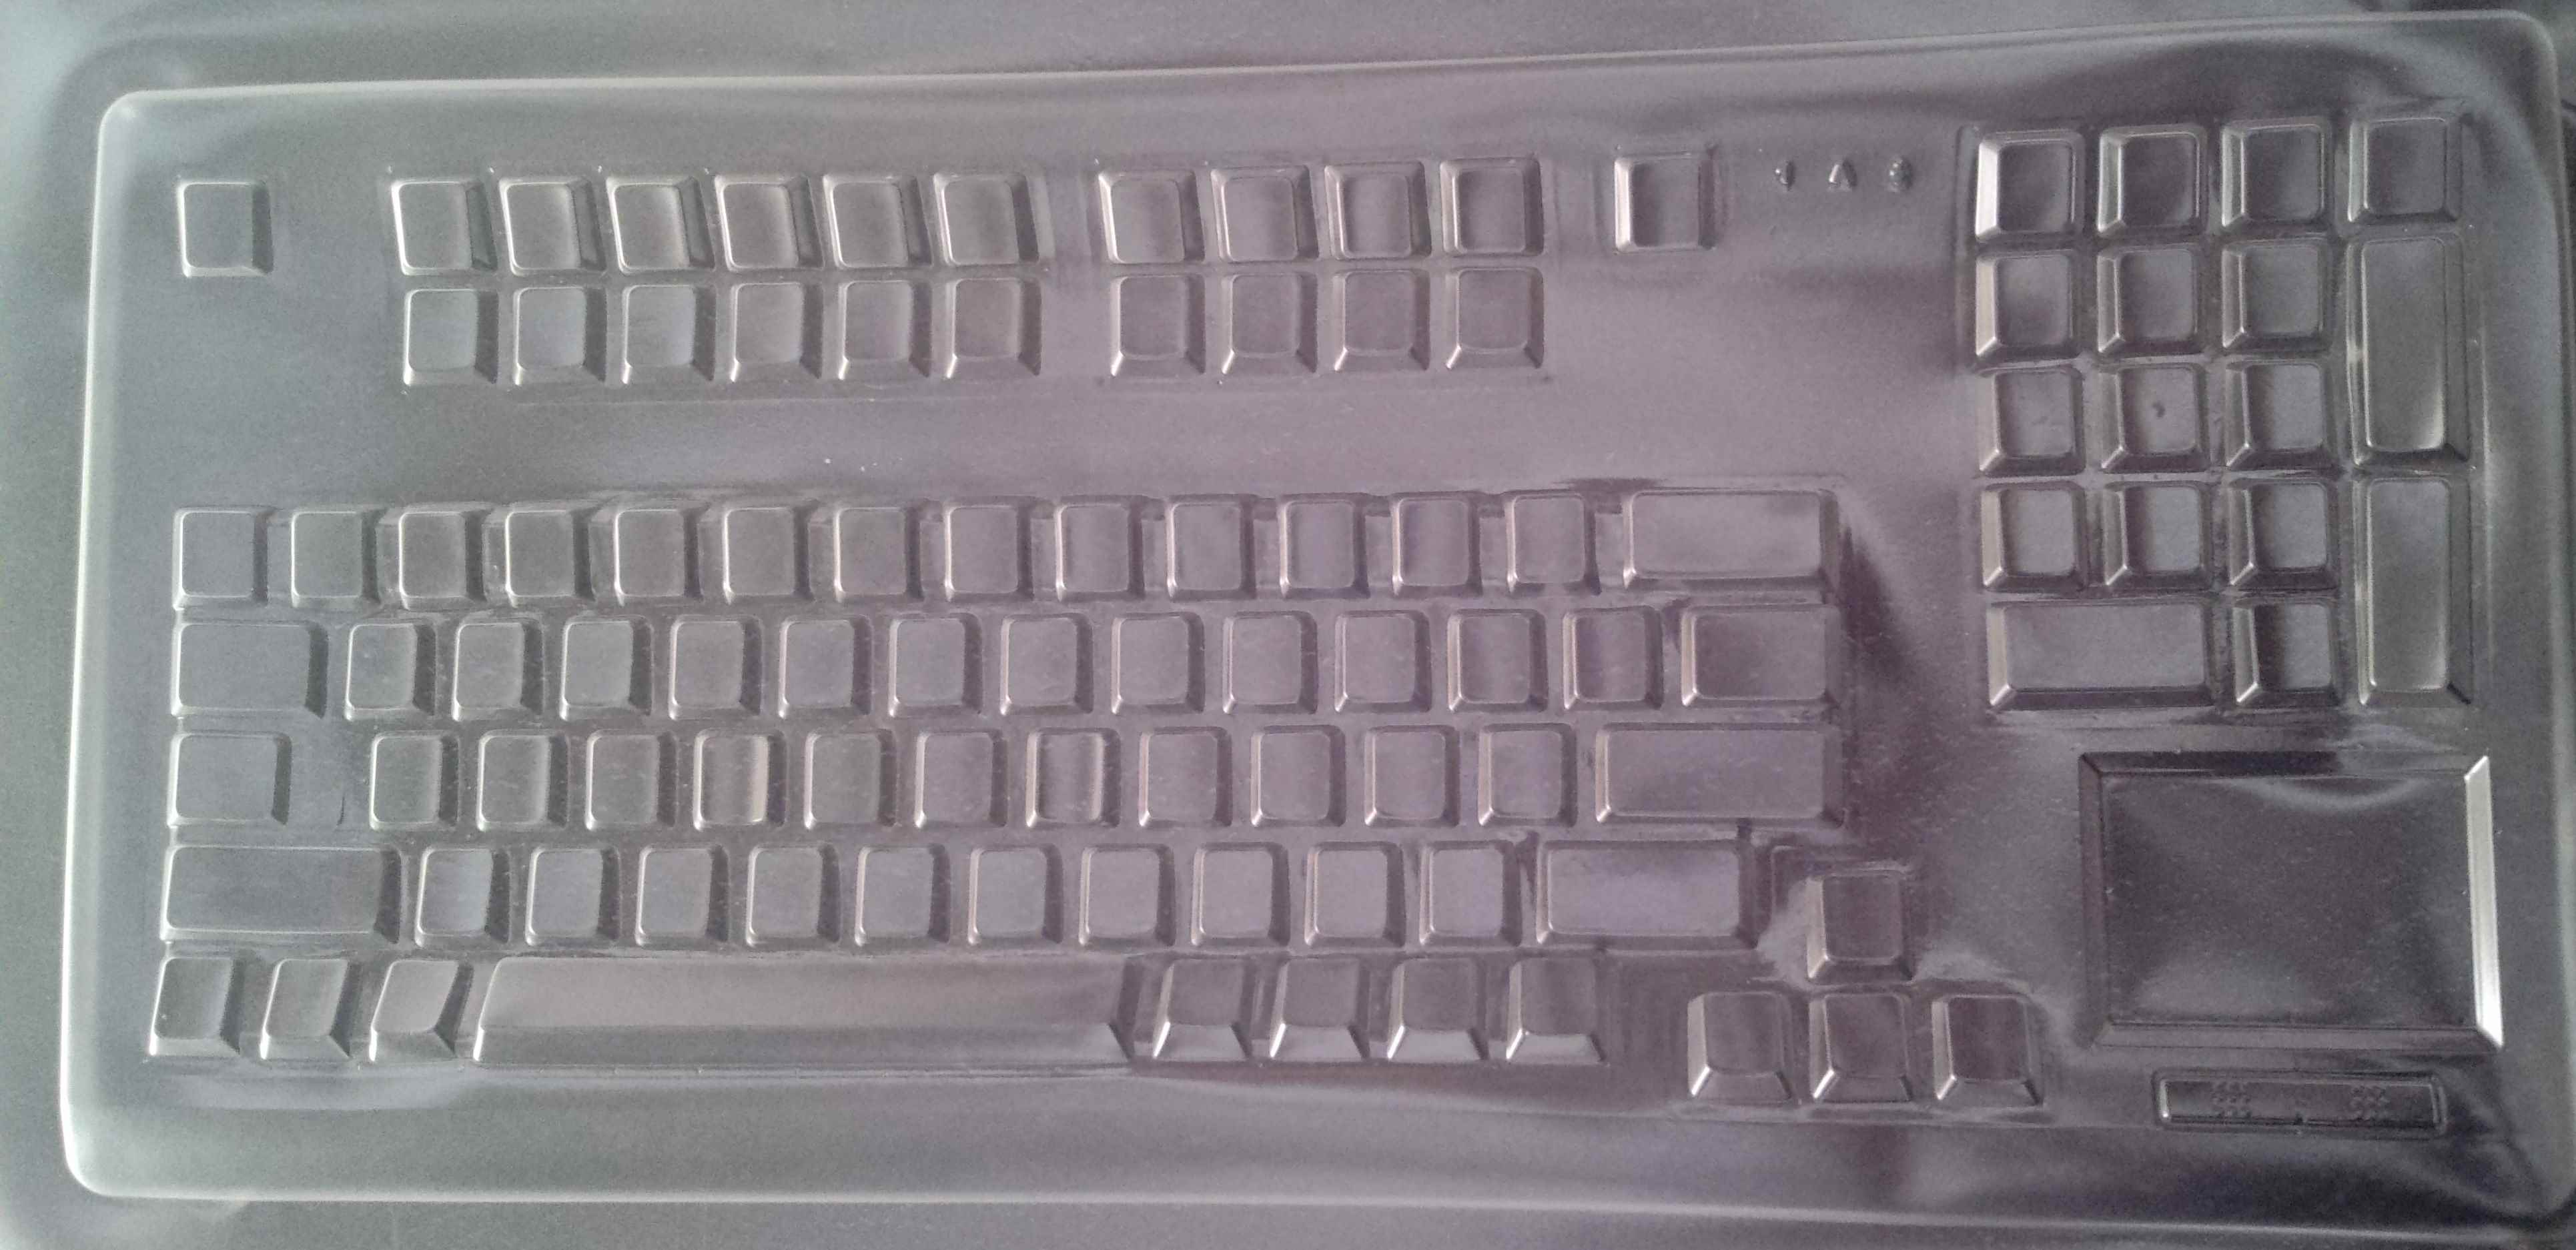 Cherry MX 11900 / G80-11900 Keyboard Cover